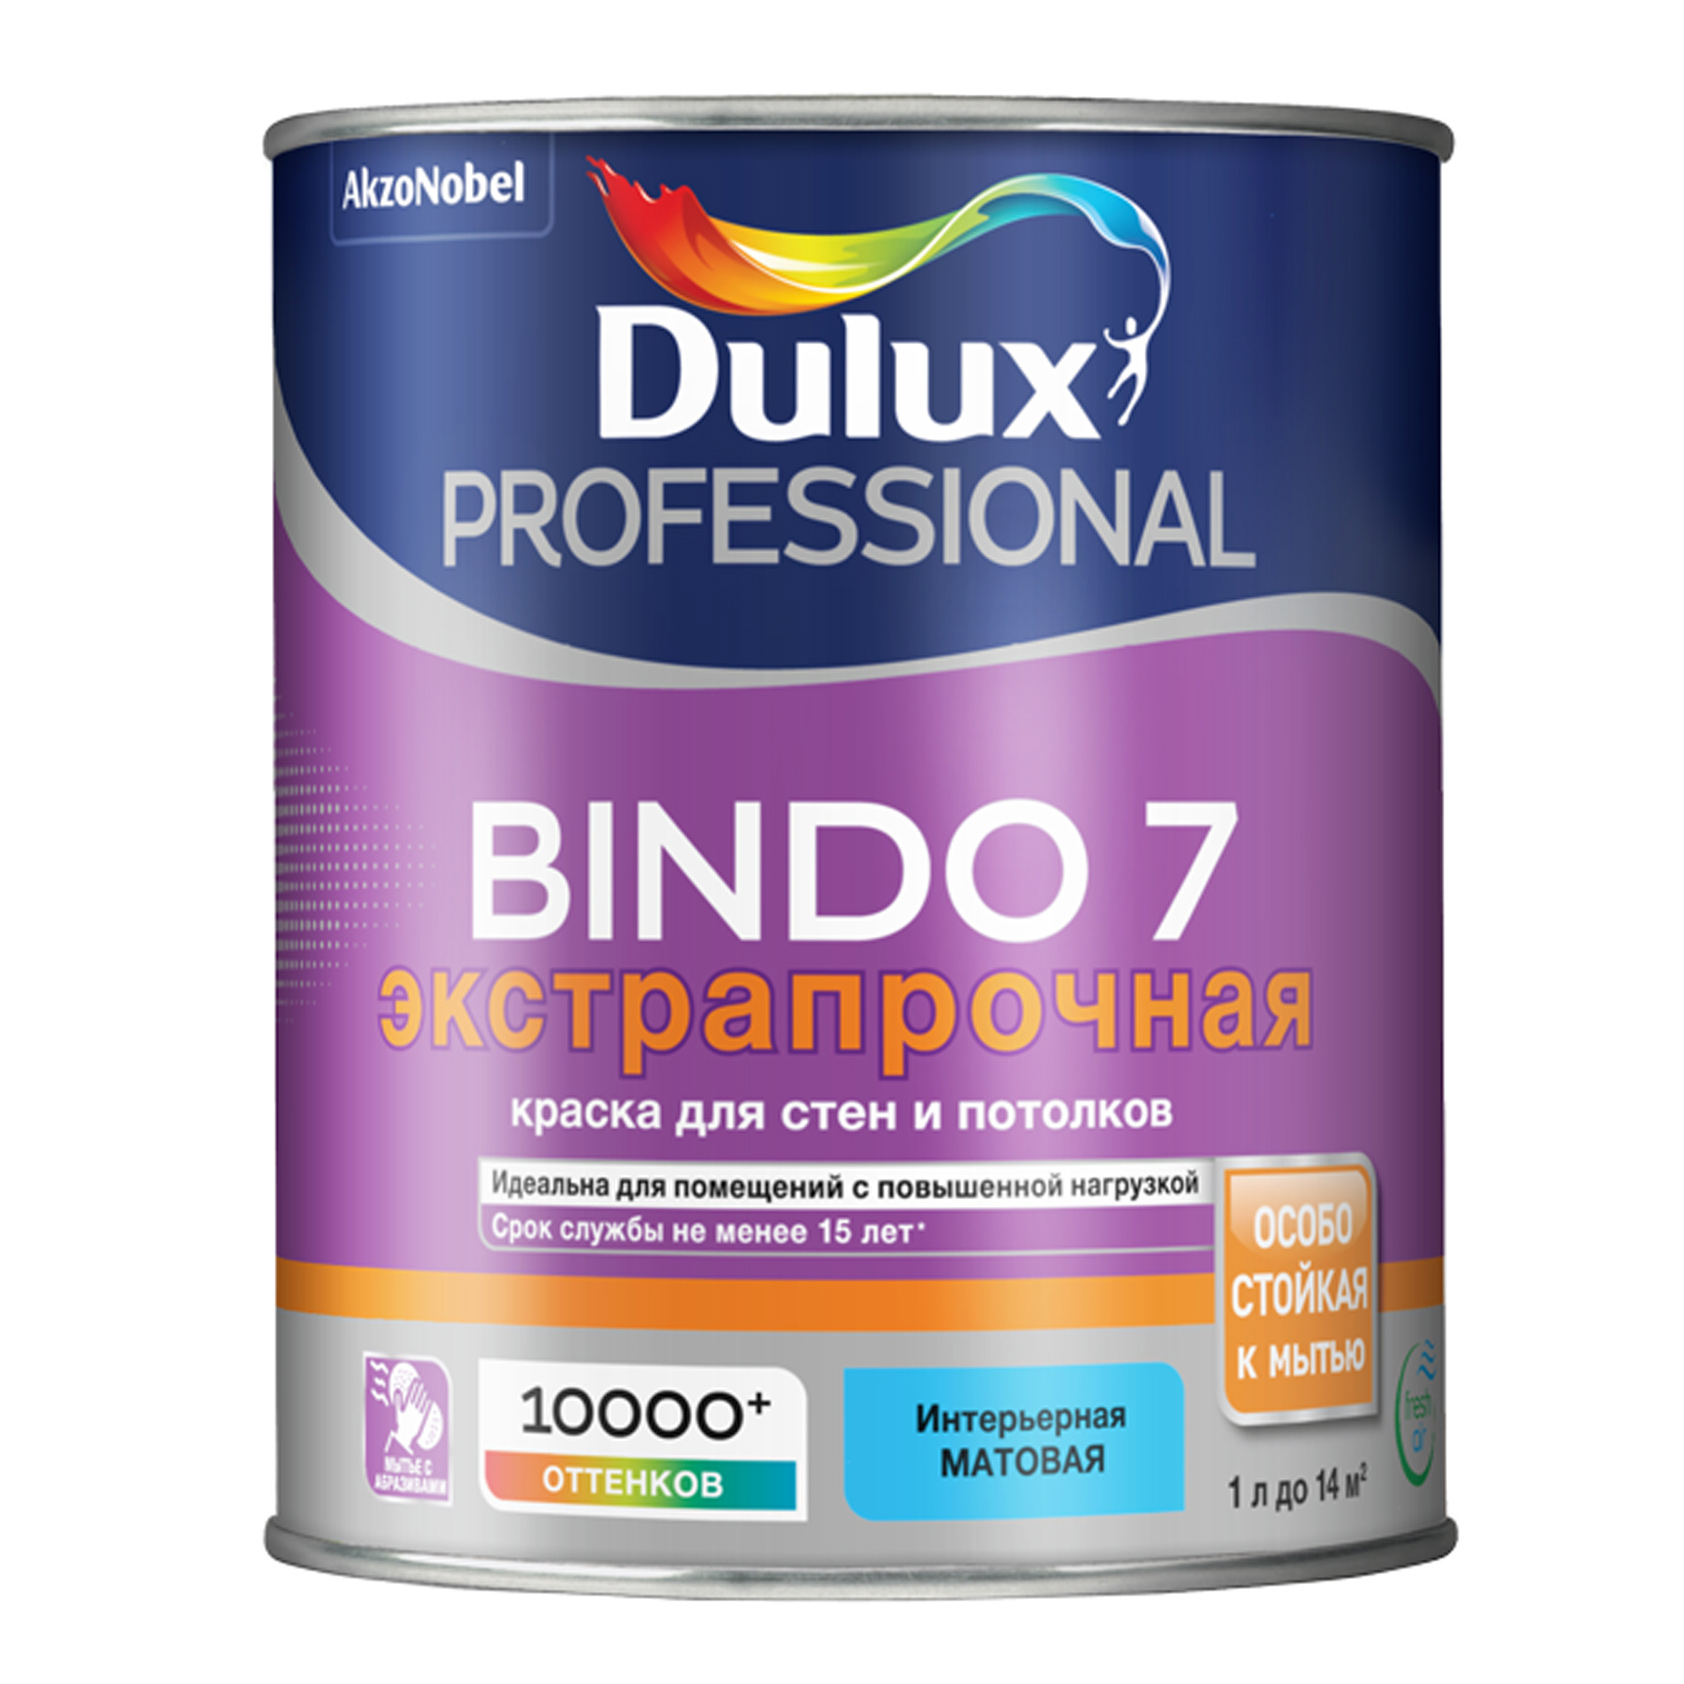 Фото - Краска для стен и потолков латексная экстрапрочная Dulux Professional Bindo 7 матовая база BC 0,9 л. краска водно дисперсионная dulux bindo 7 экстрапрочная моющаяся основа вс 1 л